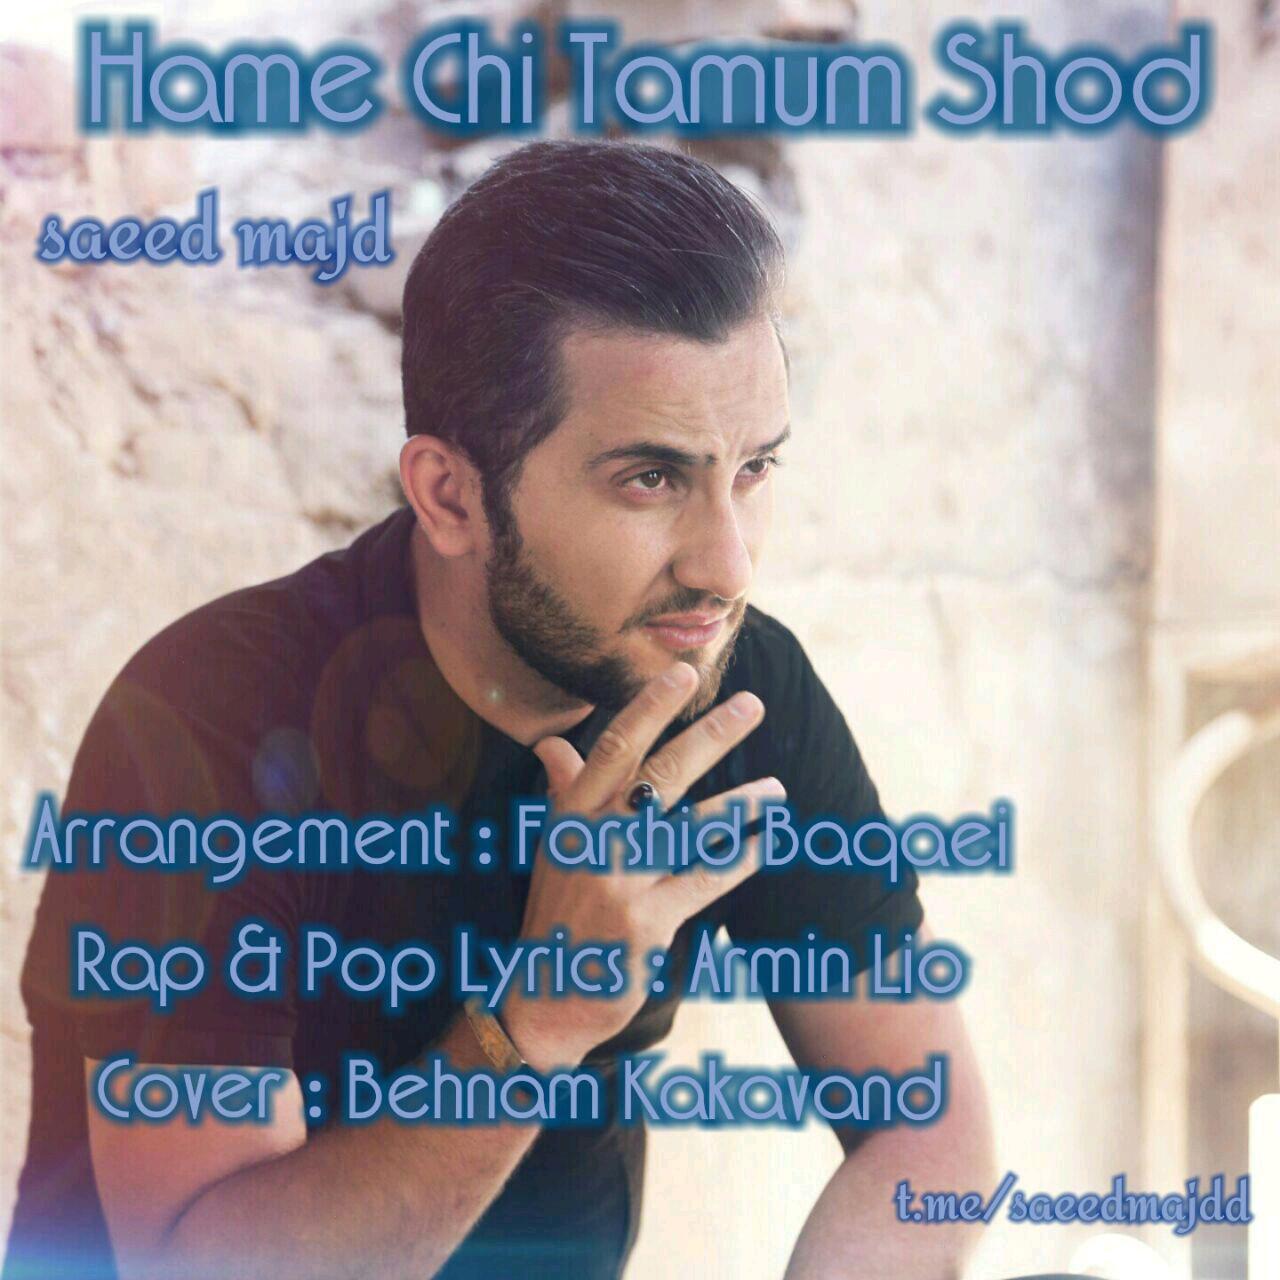 Saeed Majd – Hame Chi Tamum Shod